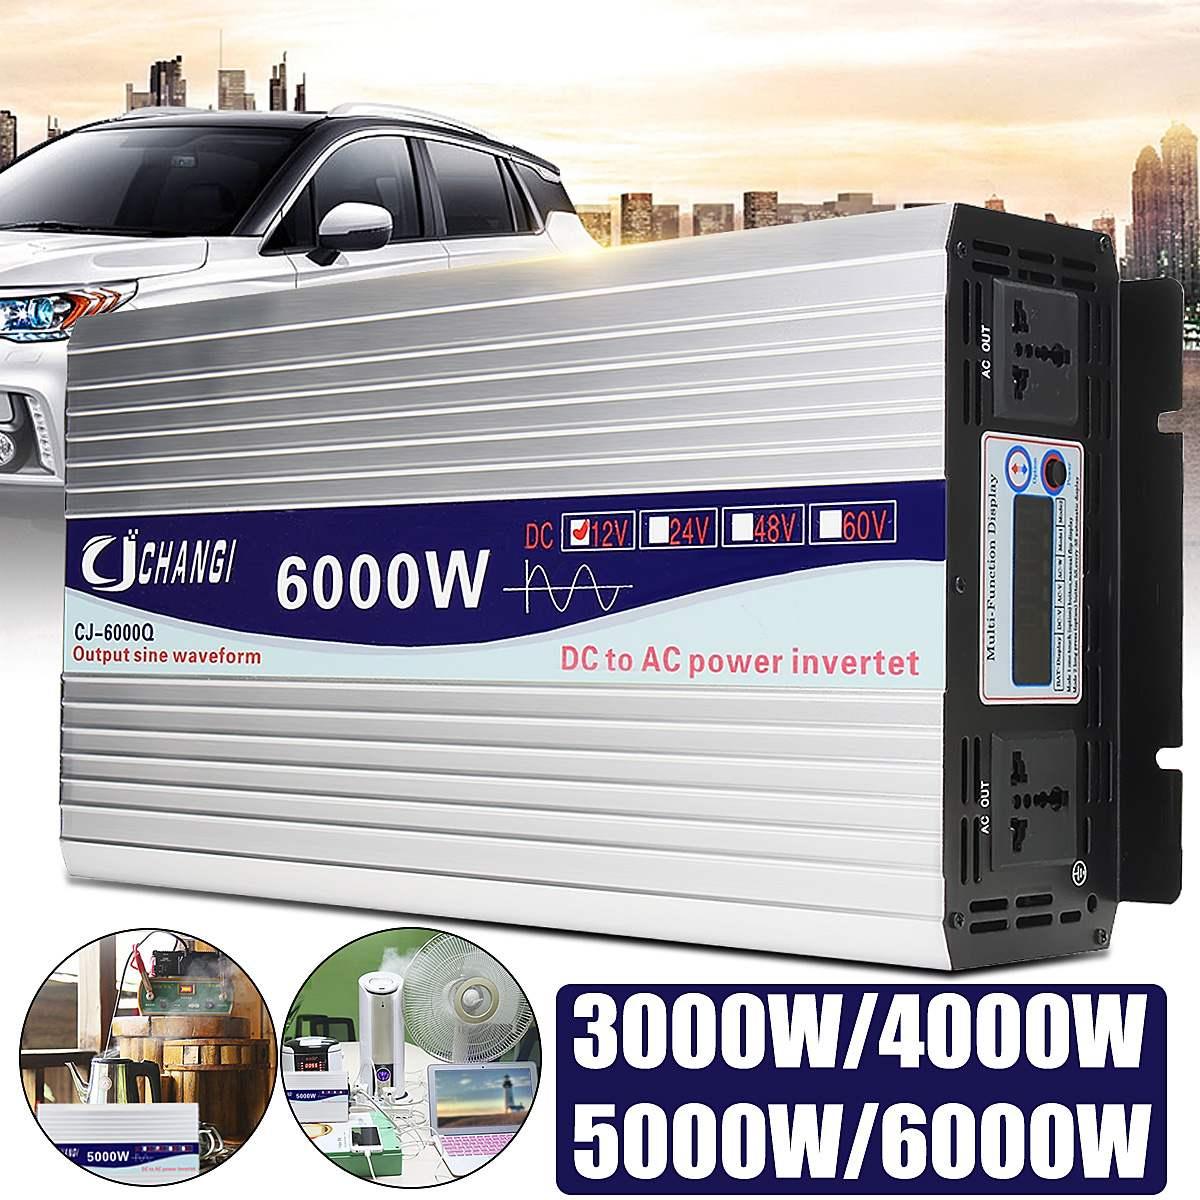 DC 12 V/24 V a AC 220V 6000/5000/4000/3000W inversor de potencia de onda sinusoidal inteligente Color LCD pantalla coche casa al aire libre inversor